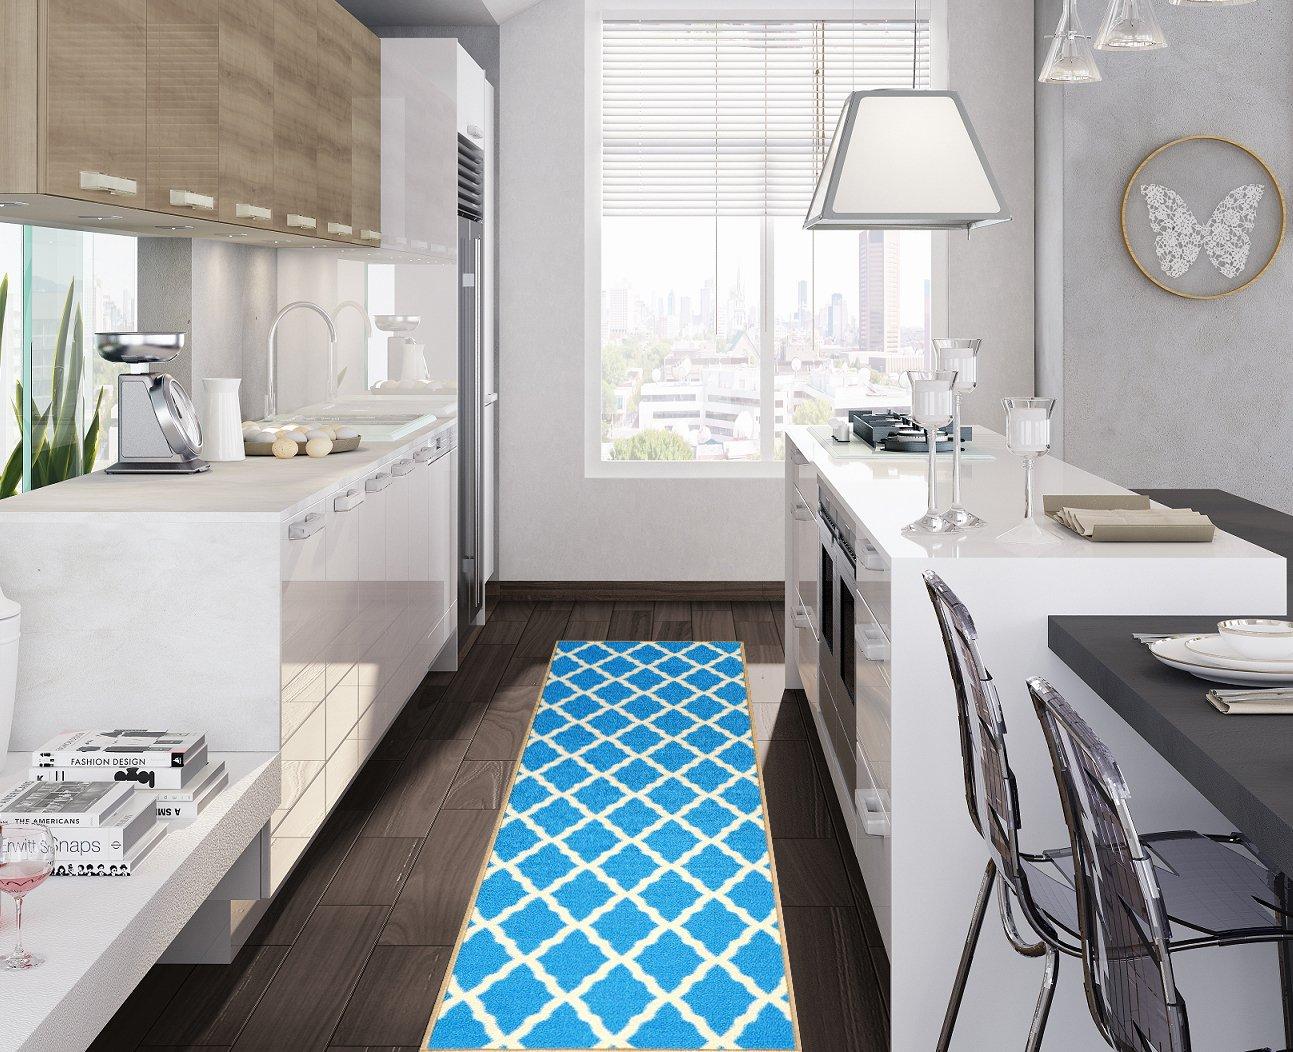 Rug Carpet Modern Design Moroccan Bedroom Lattice Runner Rugs ...